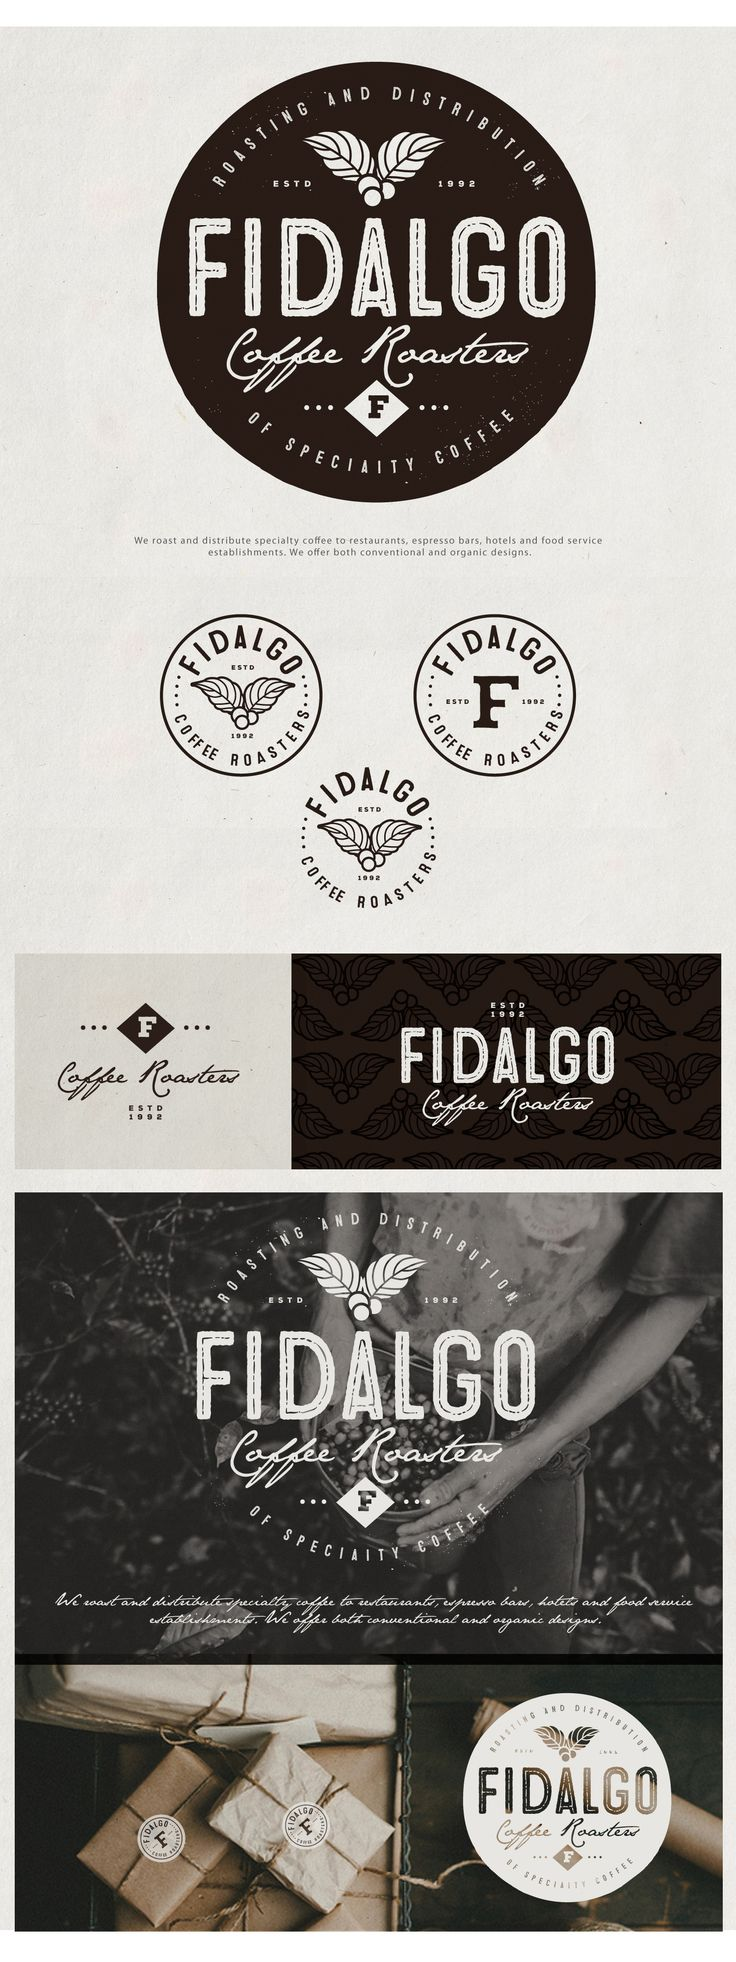 Fidalgo Coffee Roasters | 99designs                                                                                                                                                                                 More